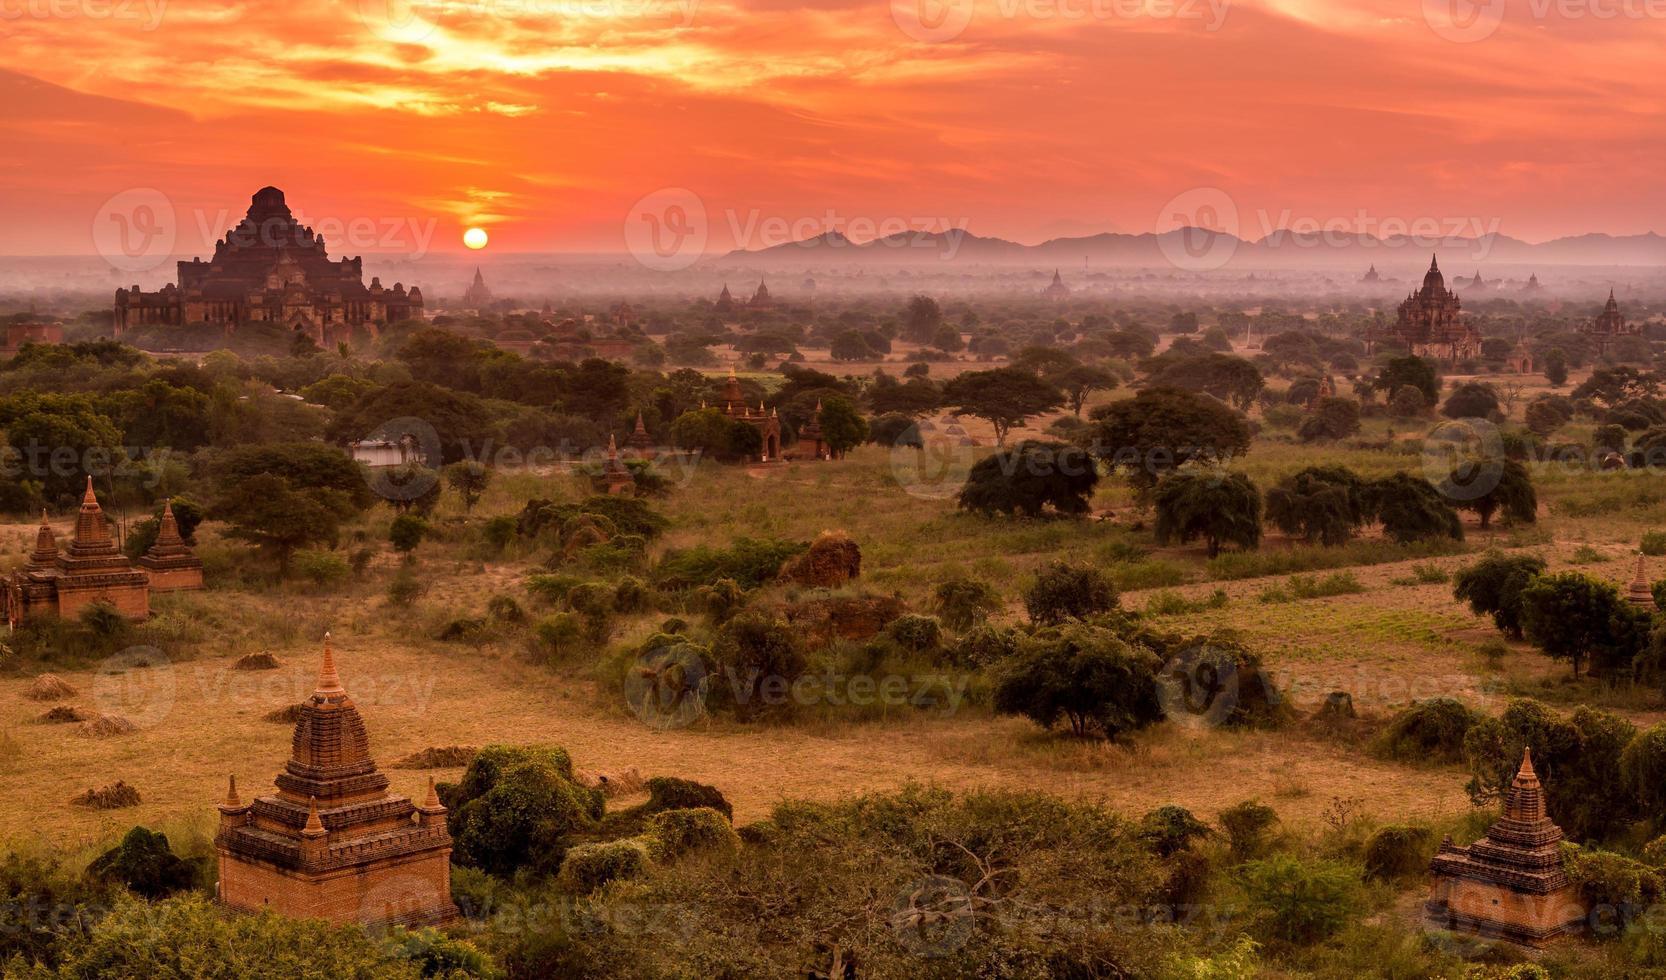 gli antichi templi buddisti di Bagan all'alba, myanmar (birmania) foto